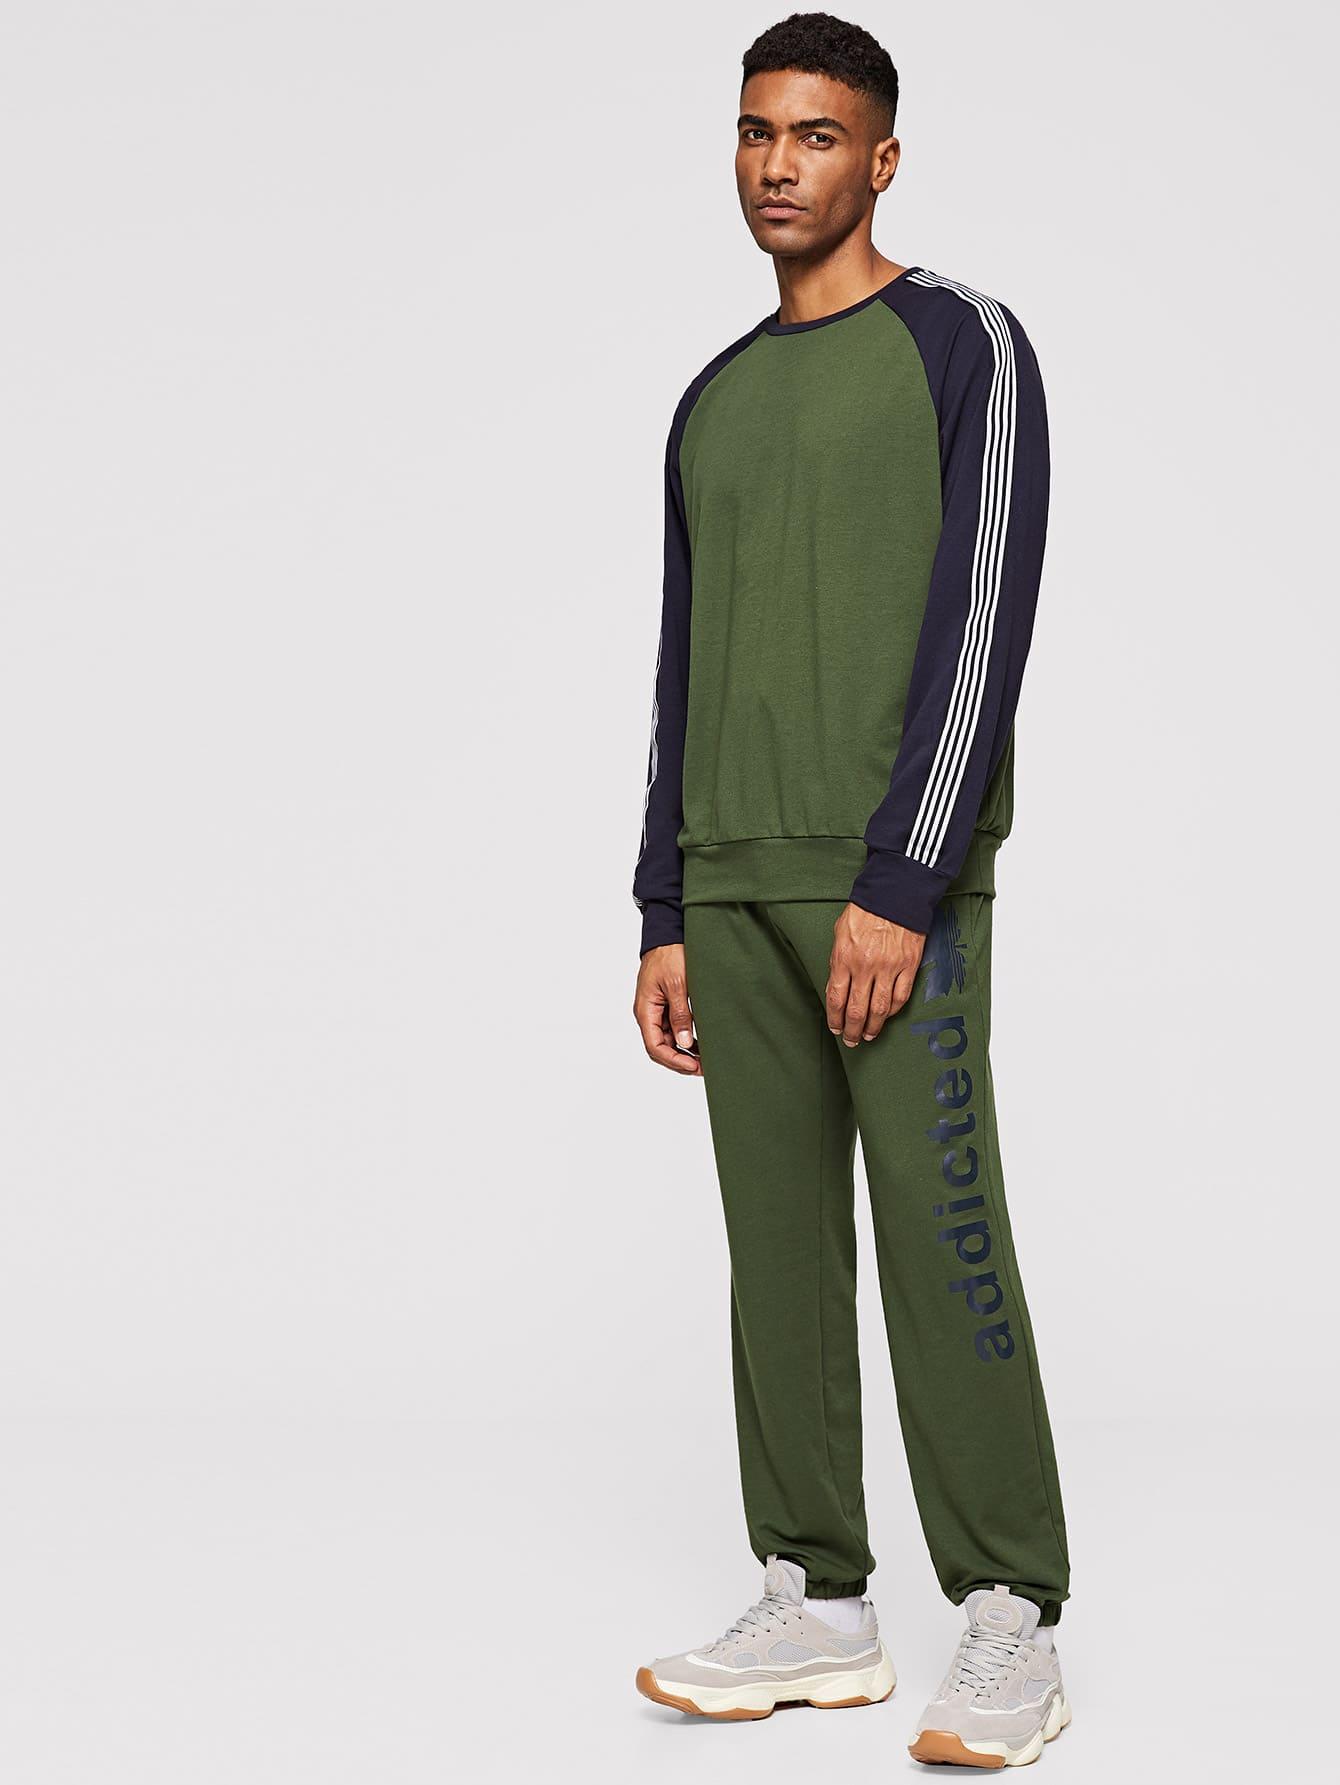 Men Raglan Sleeve Color Block Pullover & Pants Set Men Raglan Sleeve Color Block Pullover & Pants Set